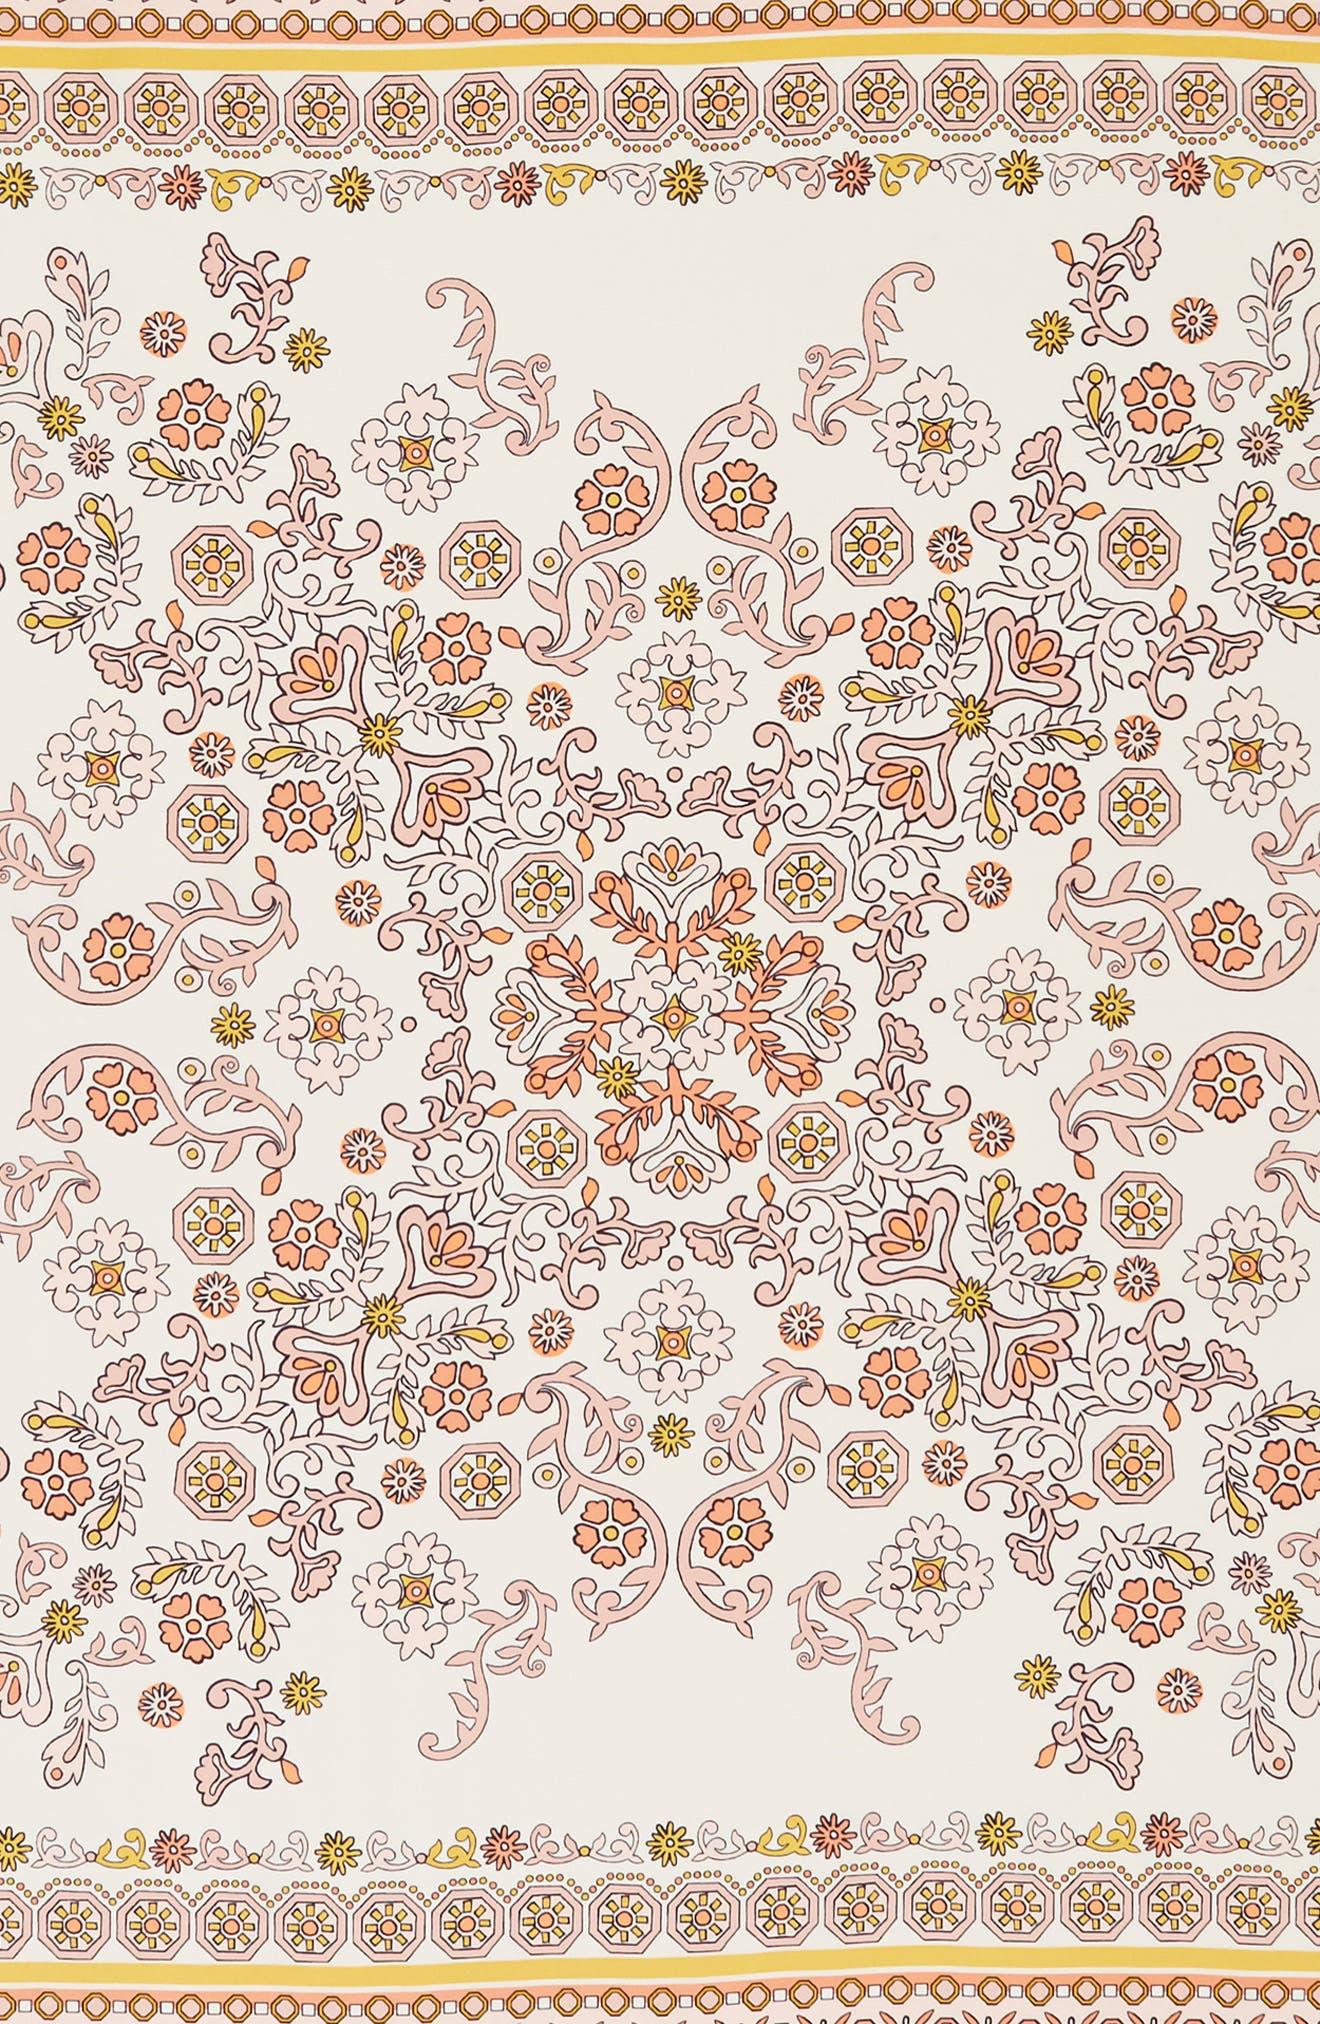 Hicks Garden Fringed Silk Scarf,                             Alternate thumbnail 4, color,